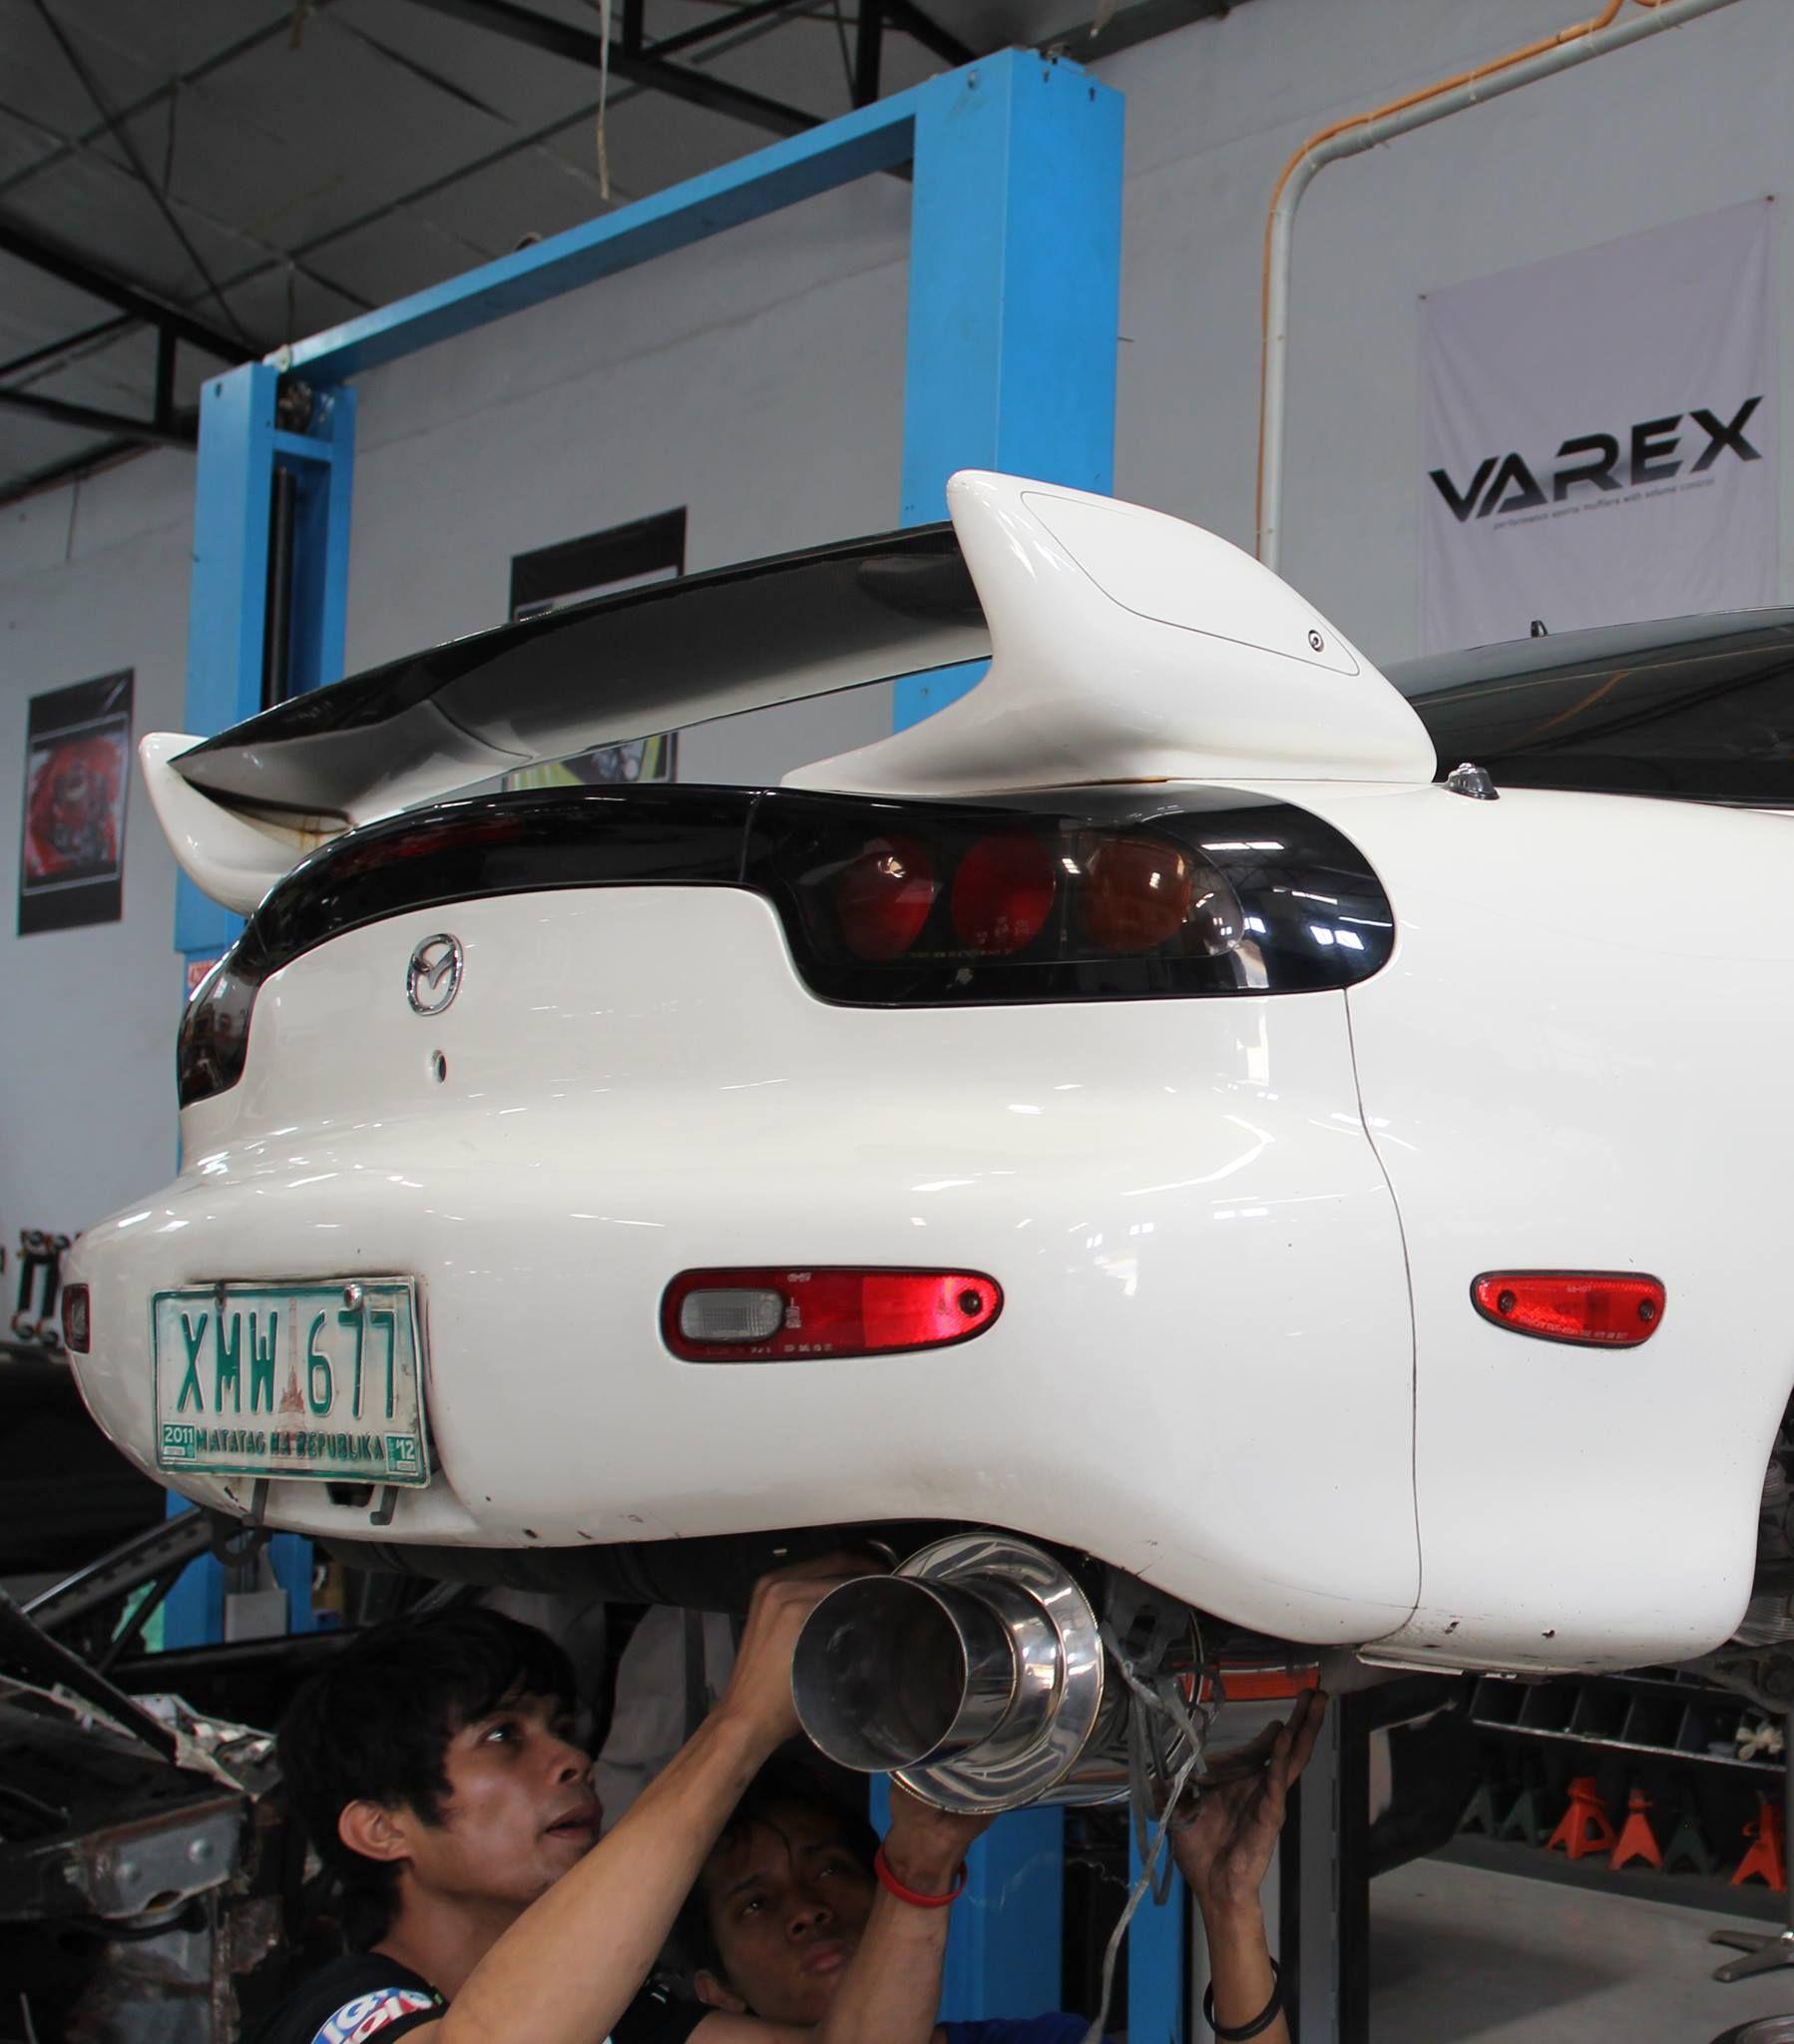 xforce varex exhaust system